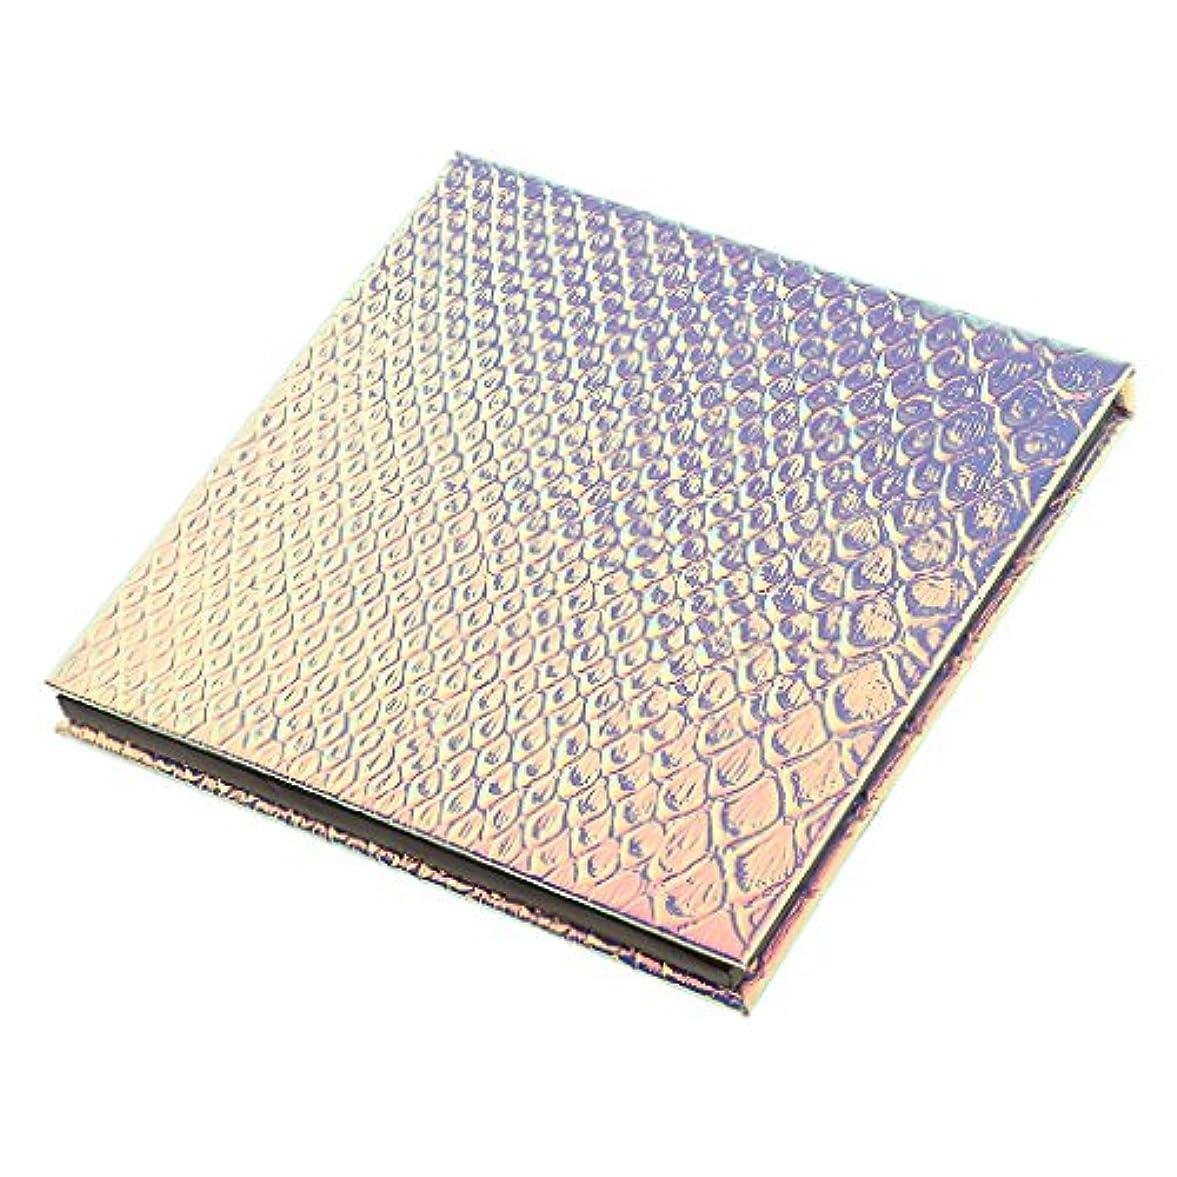 Baosity 磁気パレットボックス 空の磁気パレット メイクアップ 化粧 コスメ 収納 ボックス 全2サイズ選べ - 10x10cm